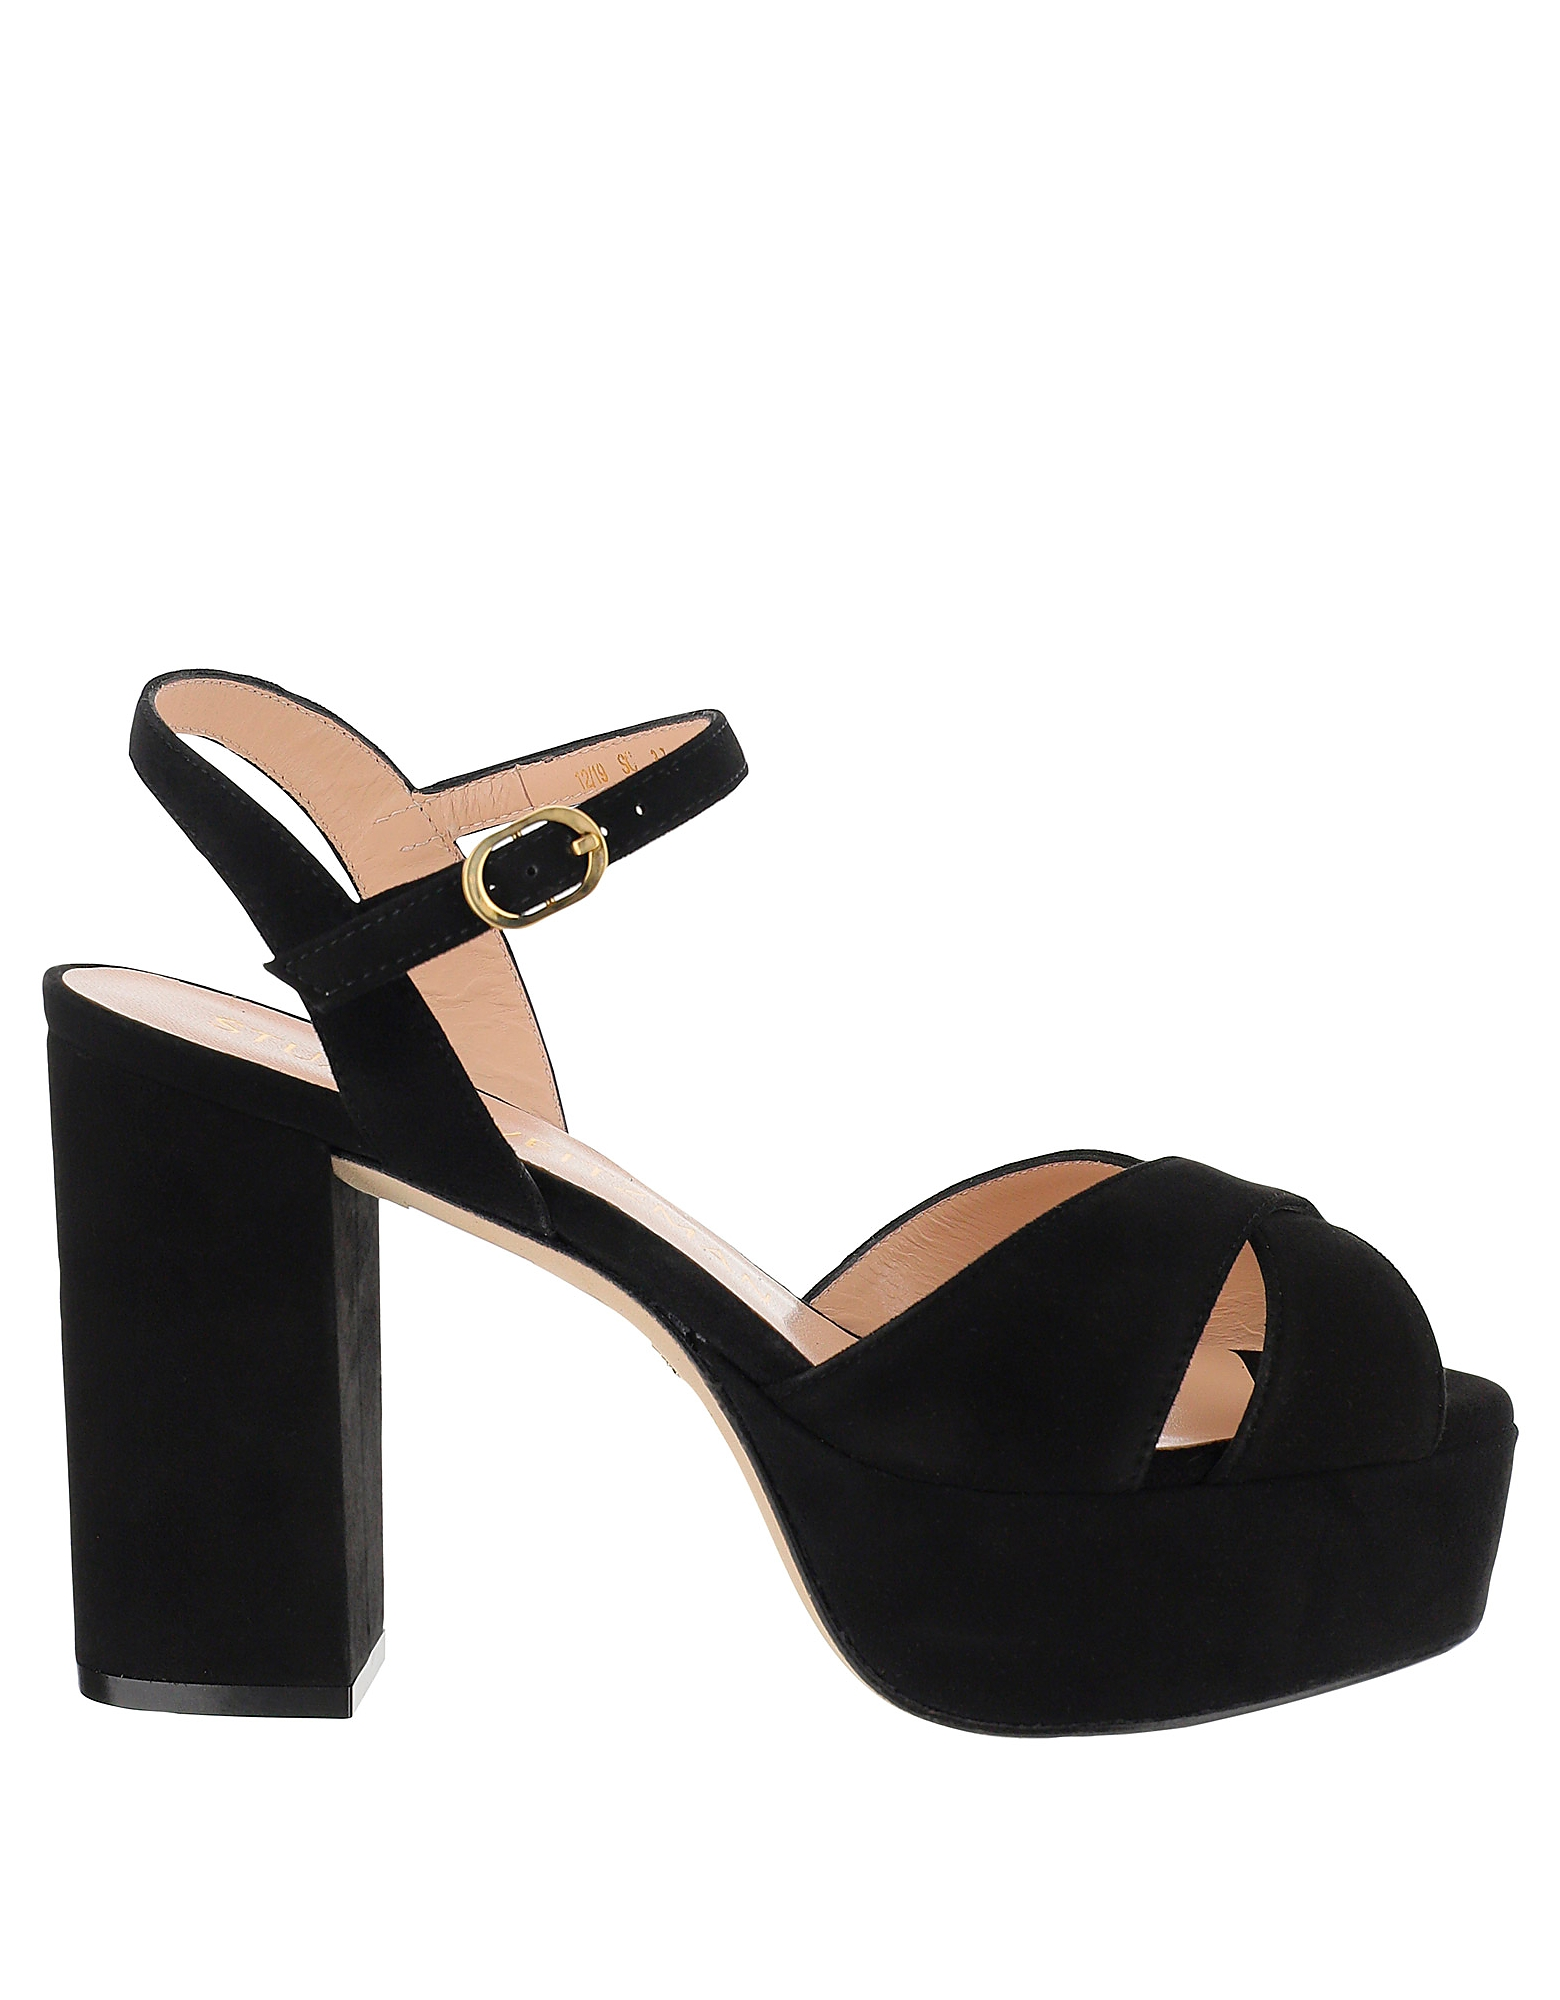 Stuart Weitzman Designer Shoes, Black Suede Platform Ivona Sandals